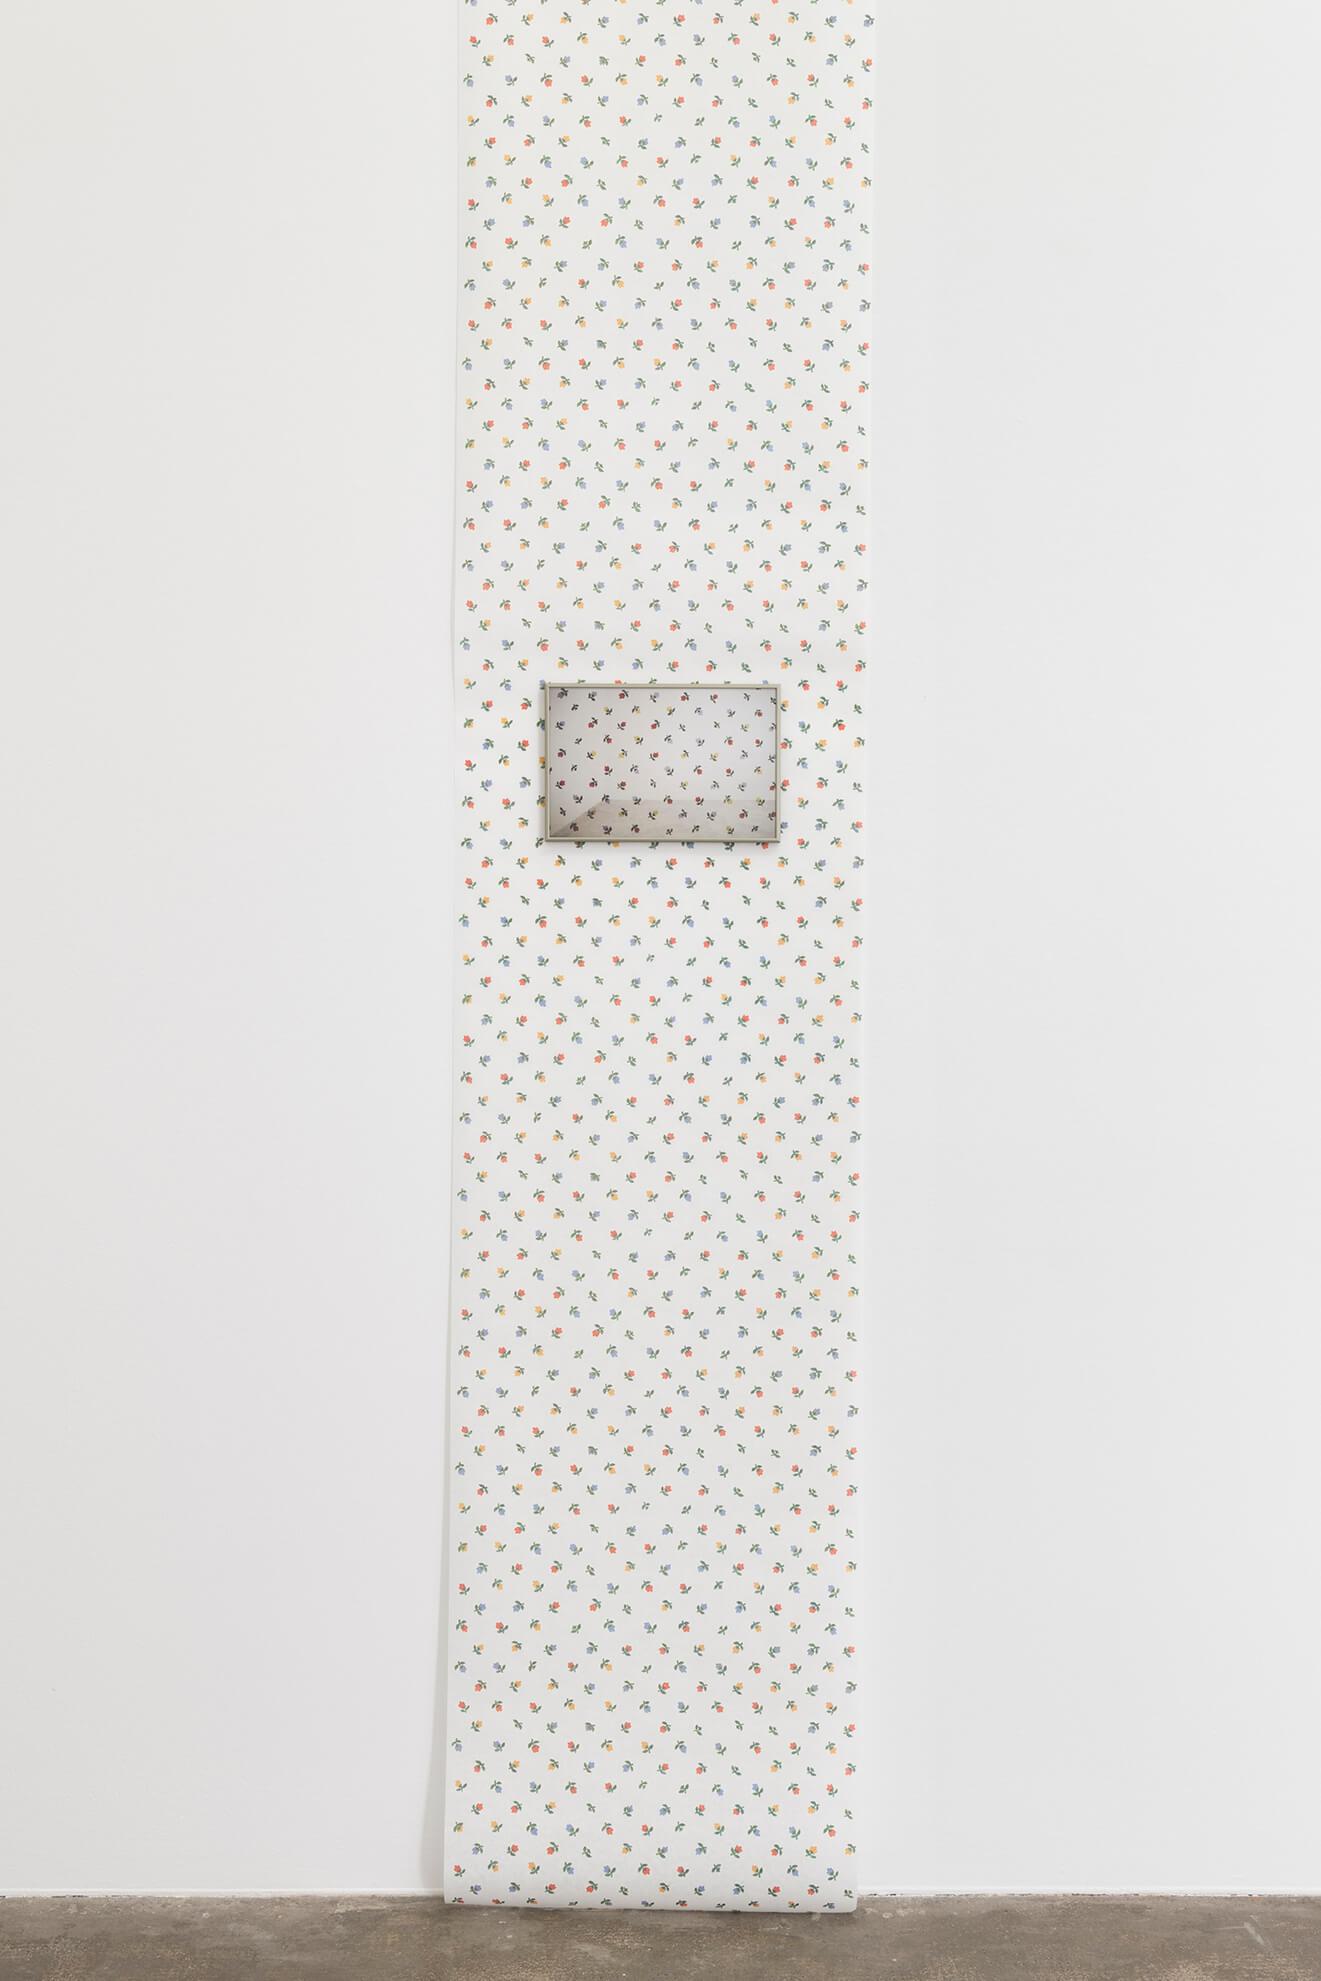 DAAN VAN GOLDEN. Tokyo / Dijon, 1996 – 2016 | El Museu Imaginari / El Museo Imaginario / The Imaginary Museum | ProjecteSD